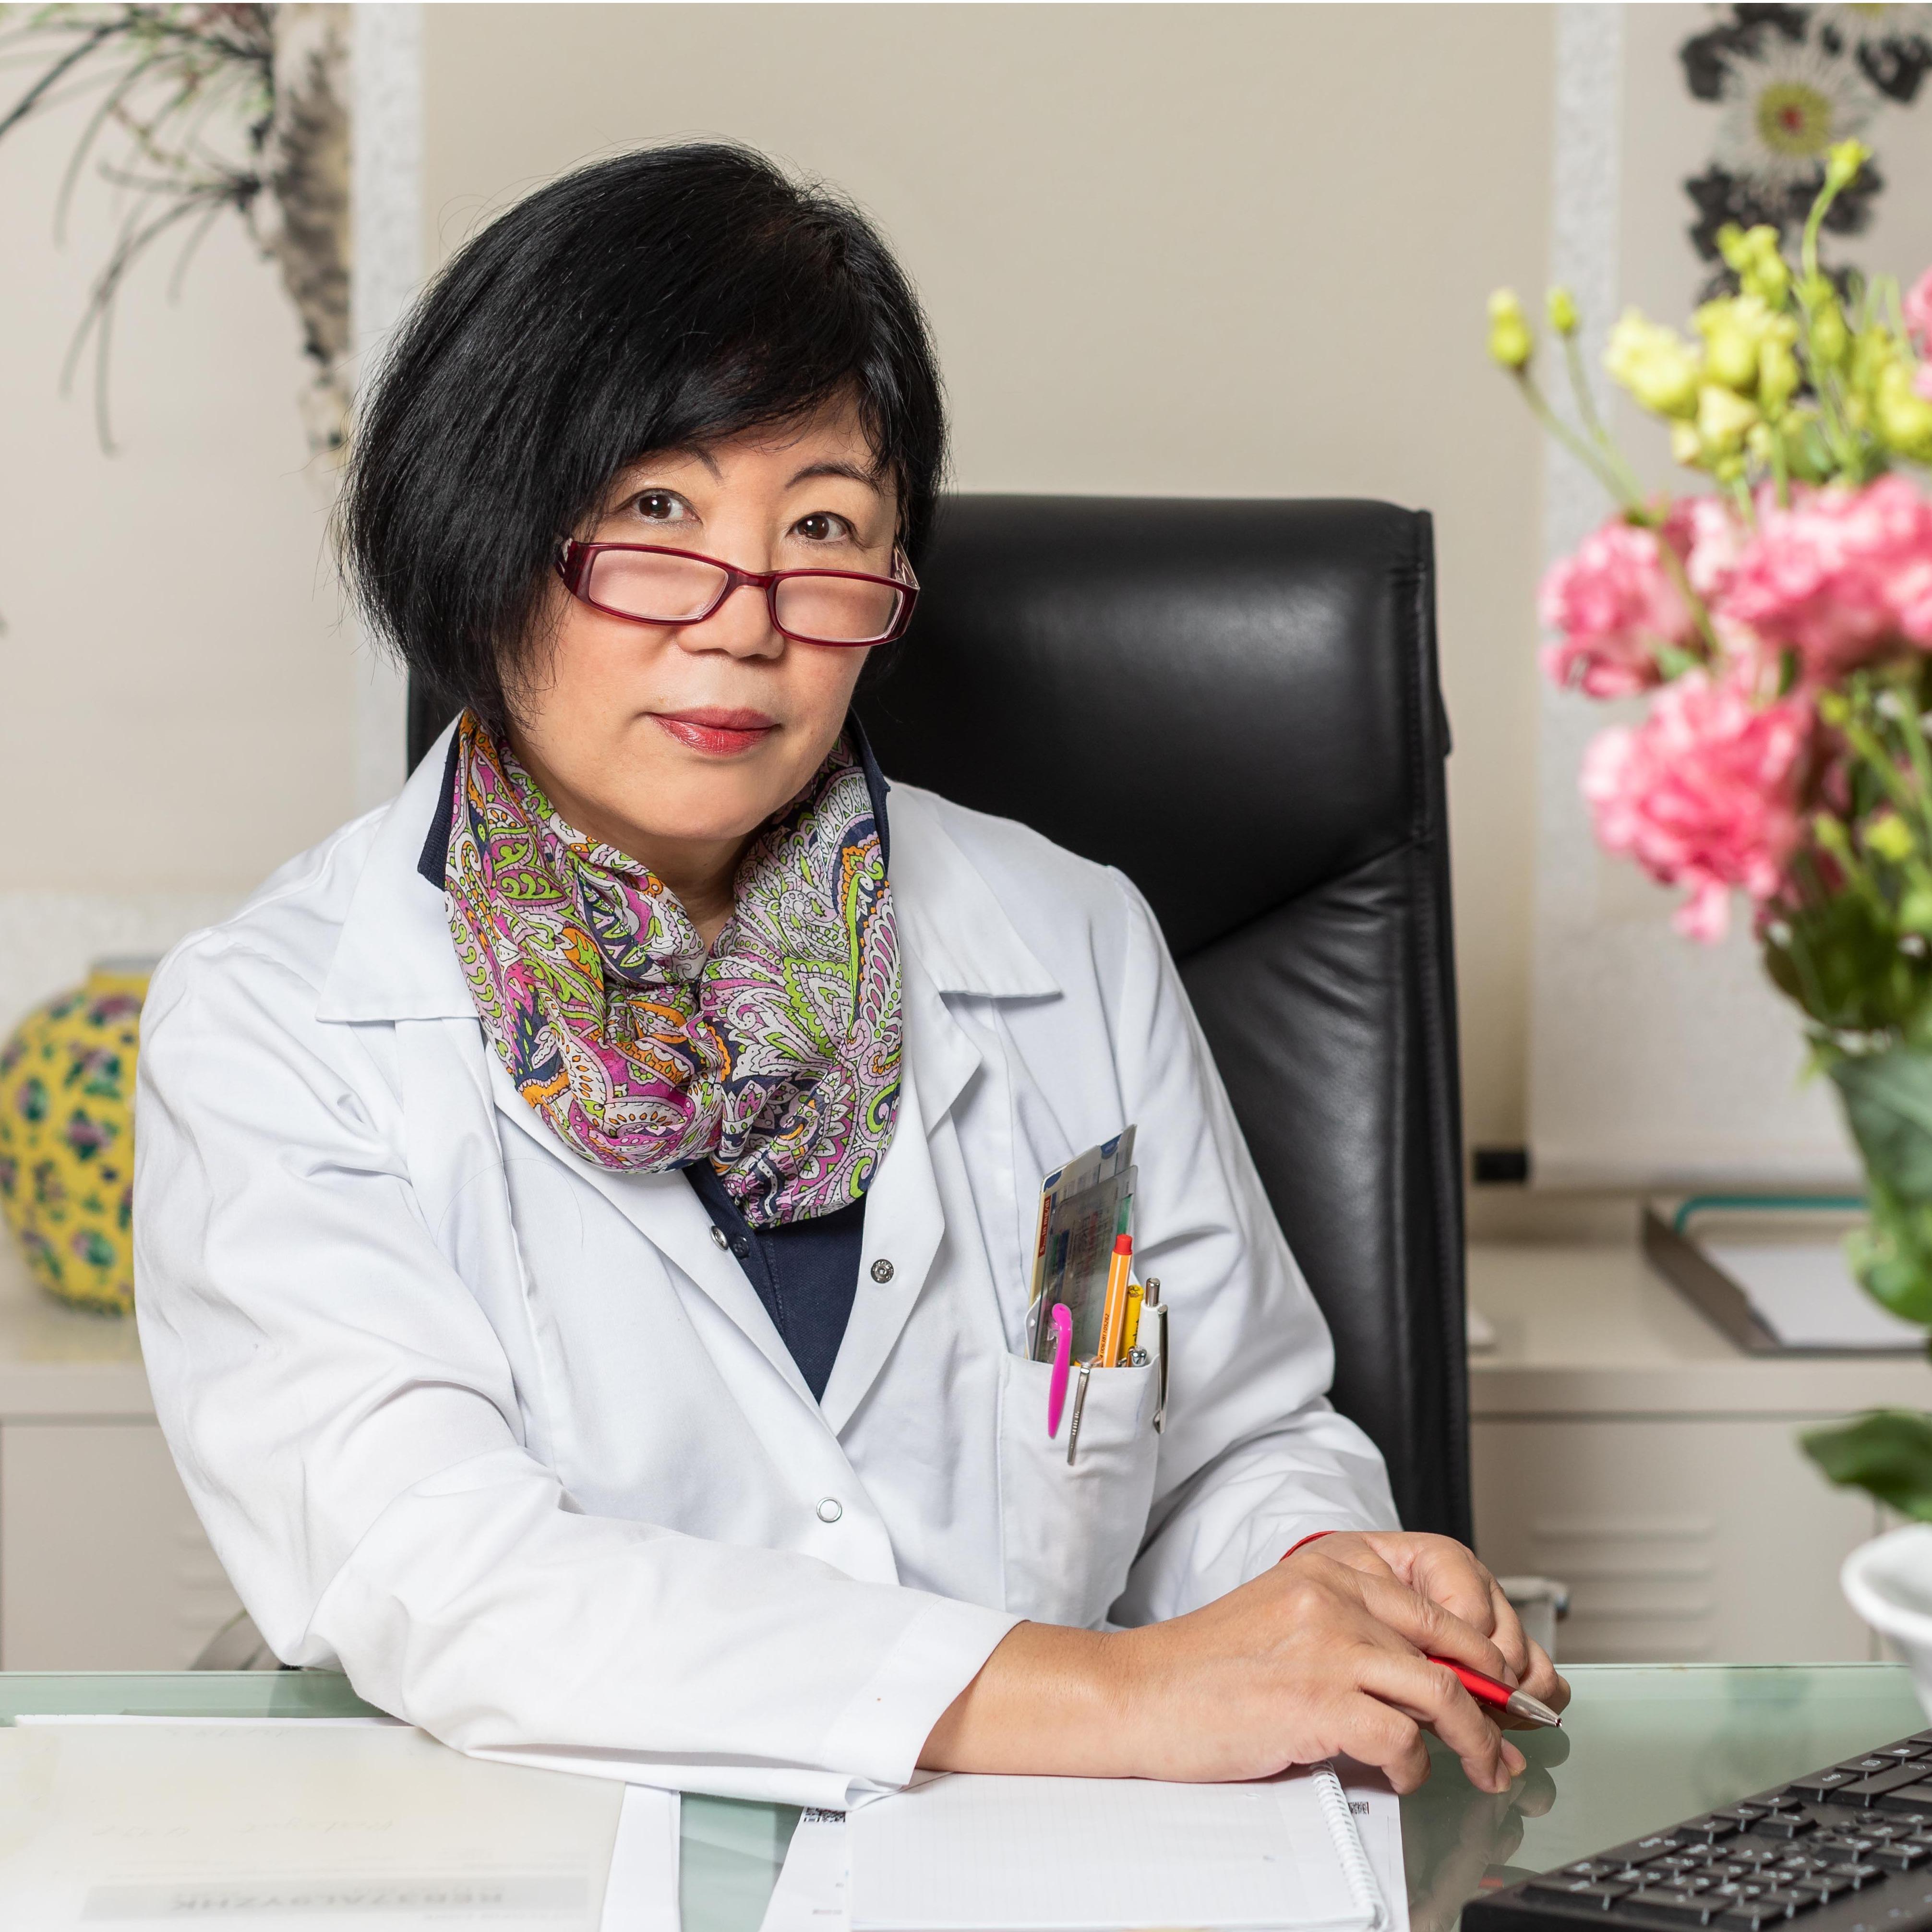 Bild zu Facharzt für innere Medizin Dr. med. Min Liu-Wallow Köln in Köln